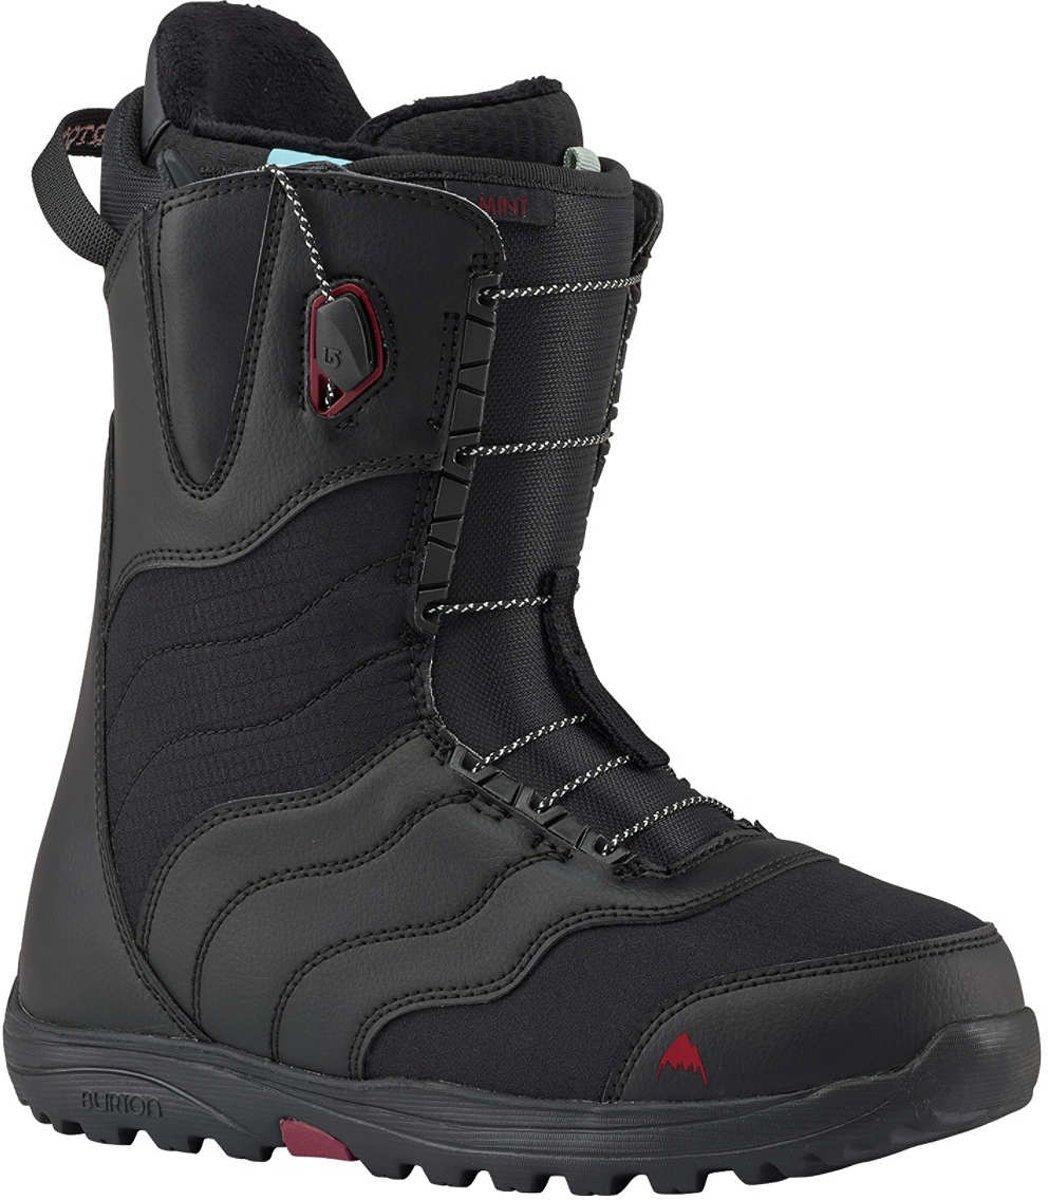 Burton Mint snowboardschoenen zwart kopen